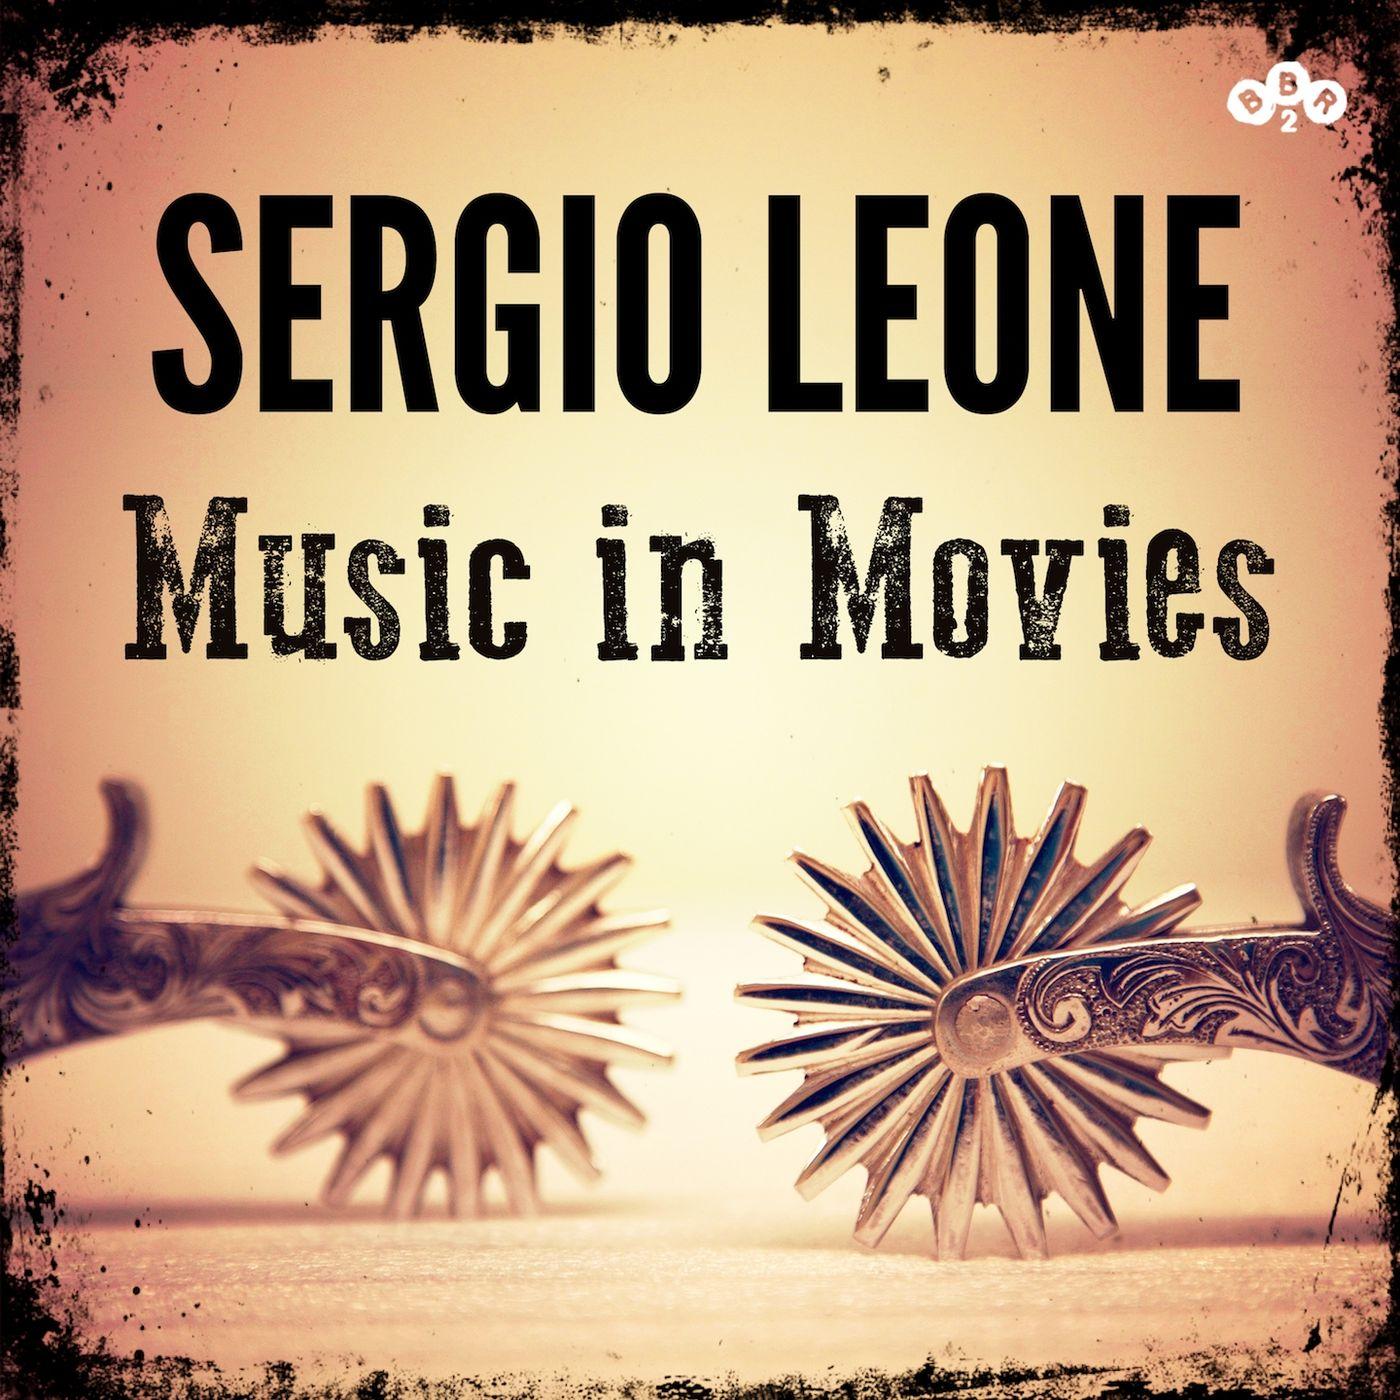 Ennio Morricone - Sergio Leone - Music in Movies (2017).mp3 - 320Kbps